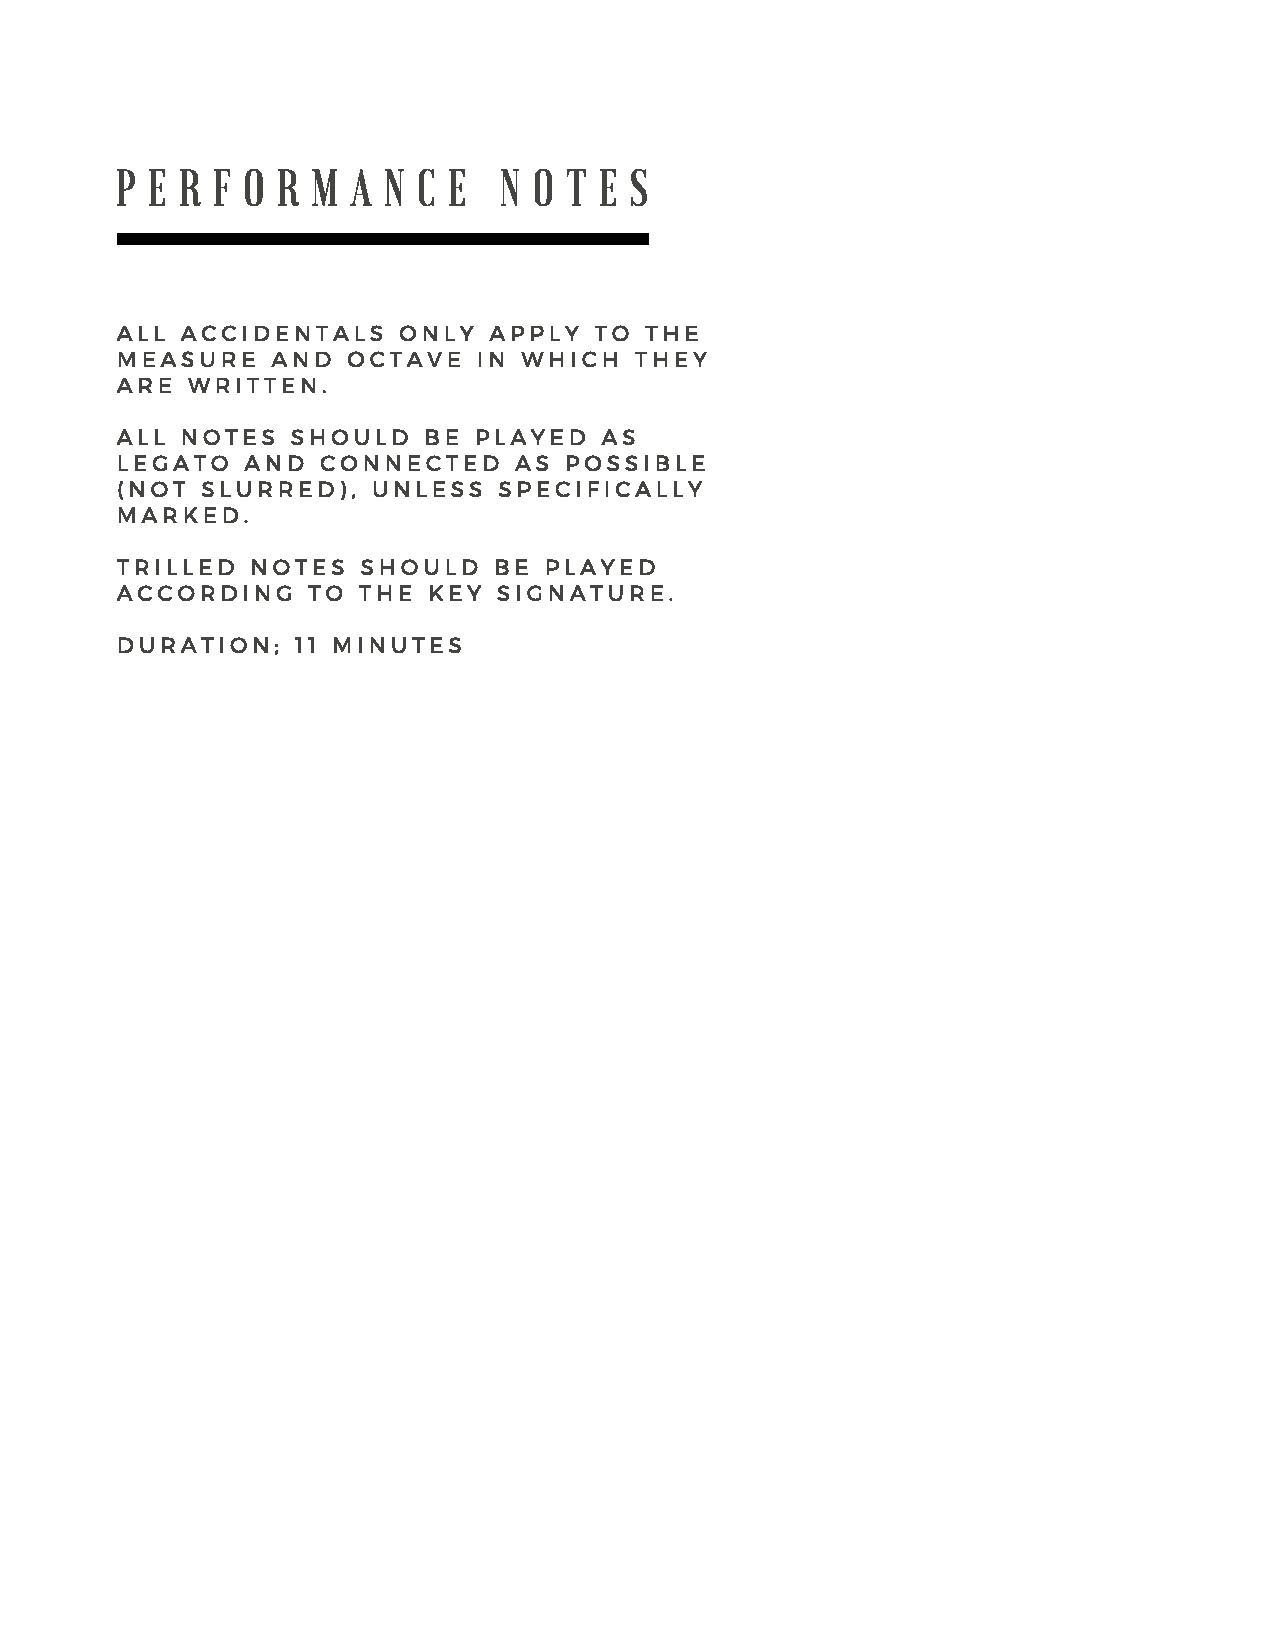 Boyd Amare Score_watermark-3-page-005.jpg